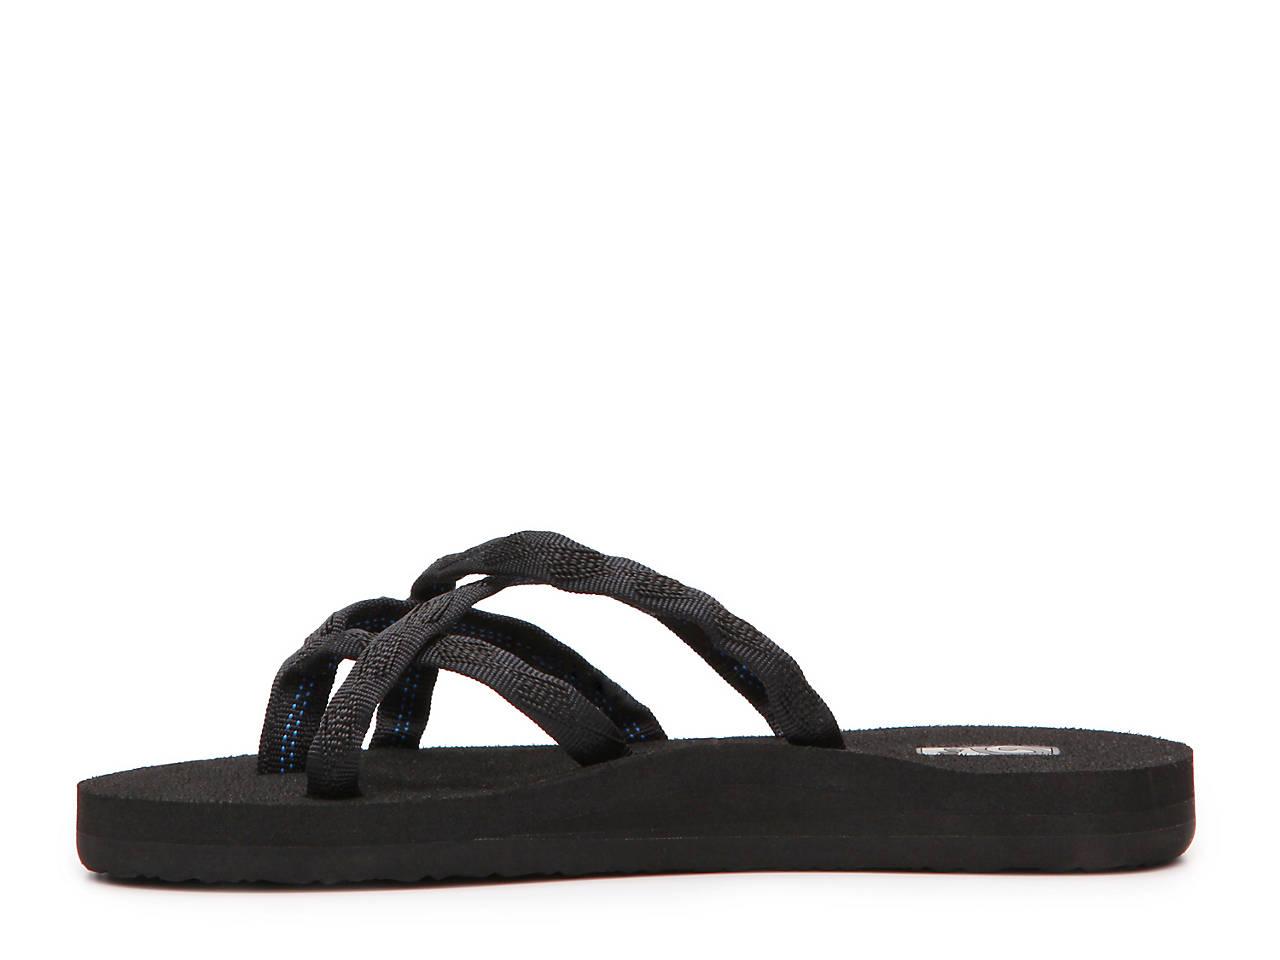 361690c00aec Teva Olowahu Flip Flop Women s Shoes